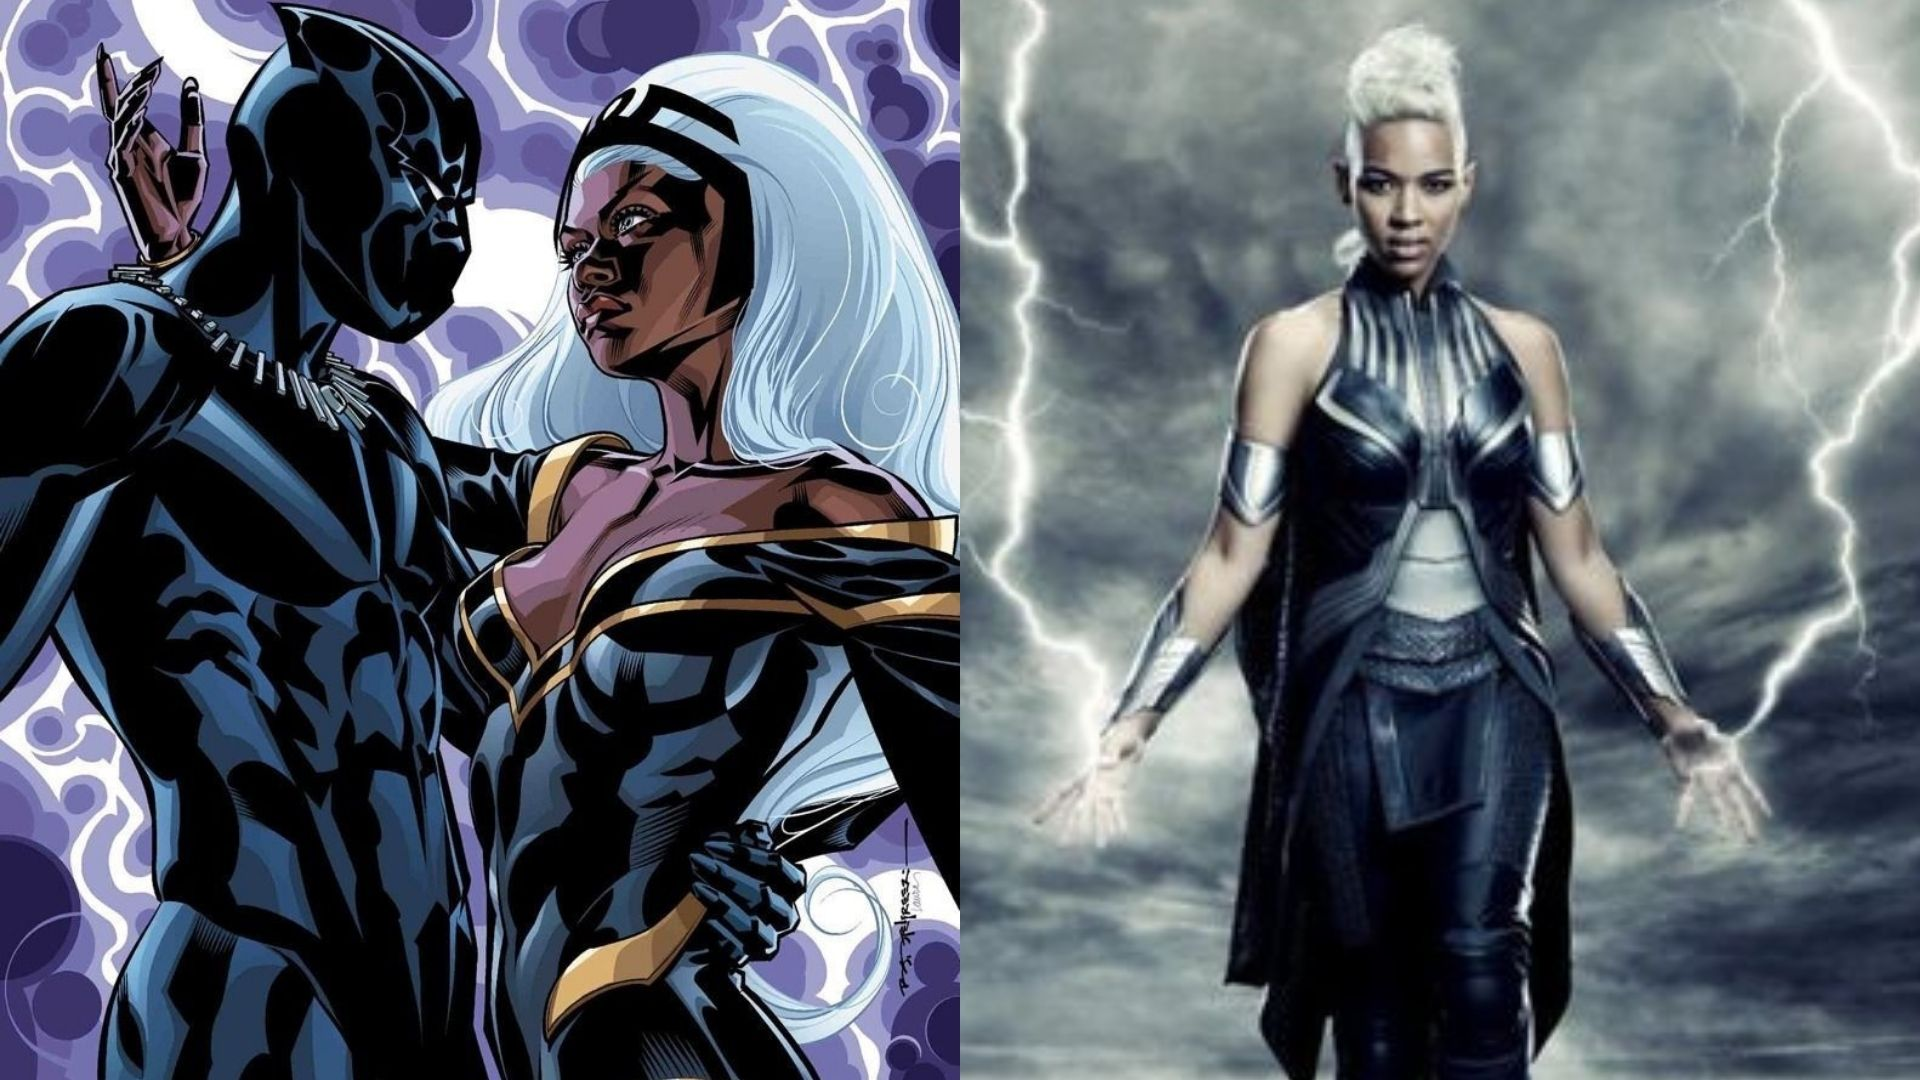 【X-MEN】ストームの強さ・能力・誕生・活躍について解説!【マーベル原作】